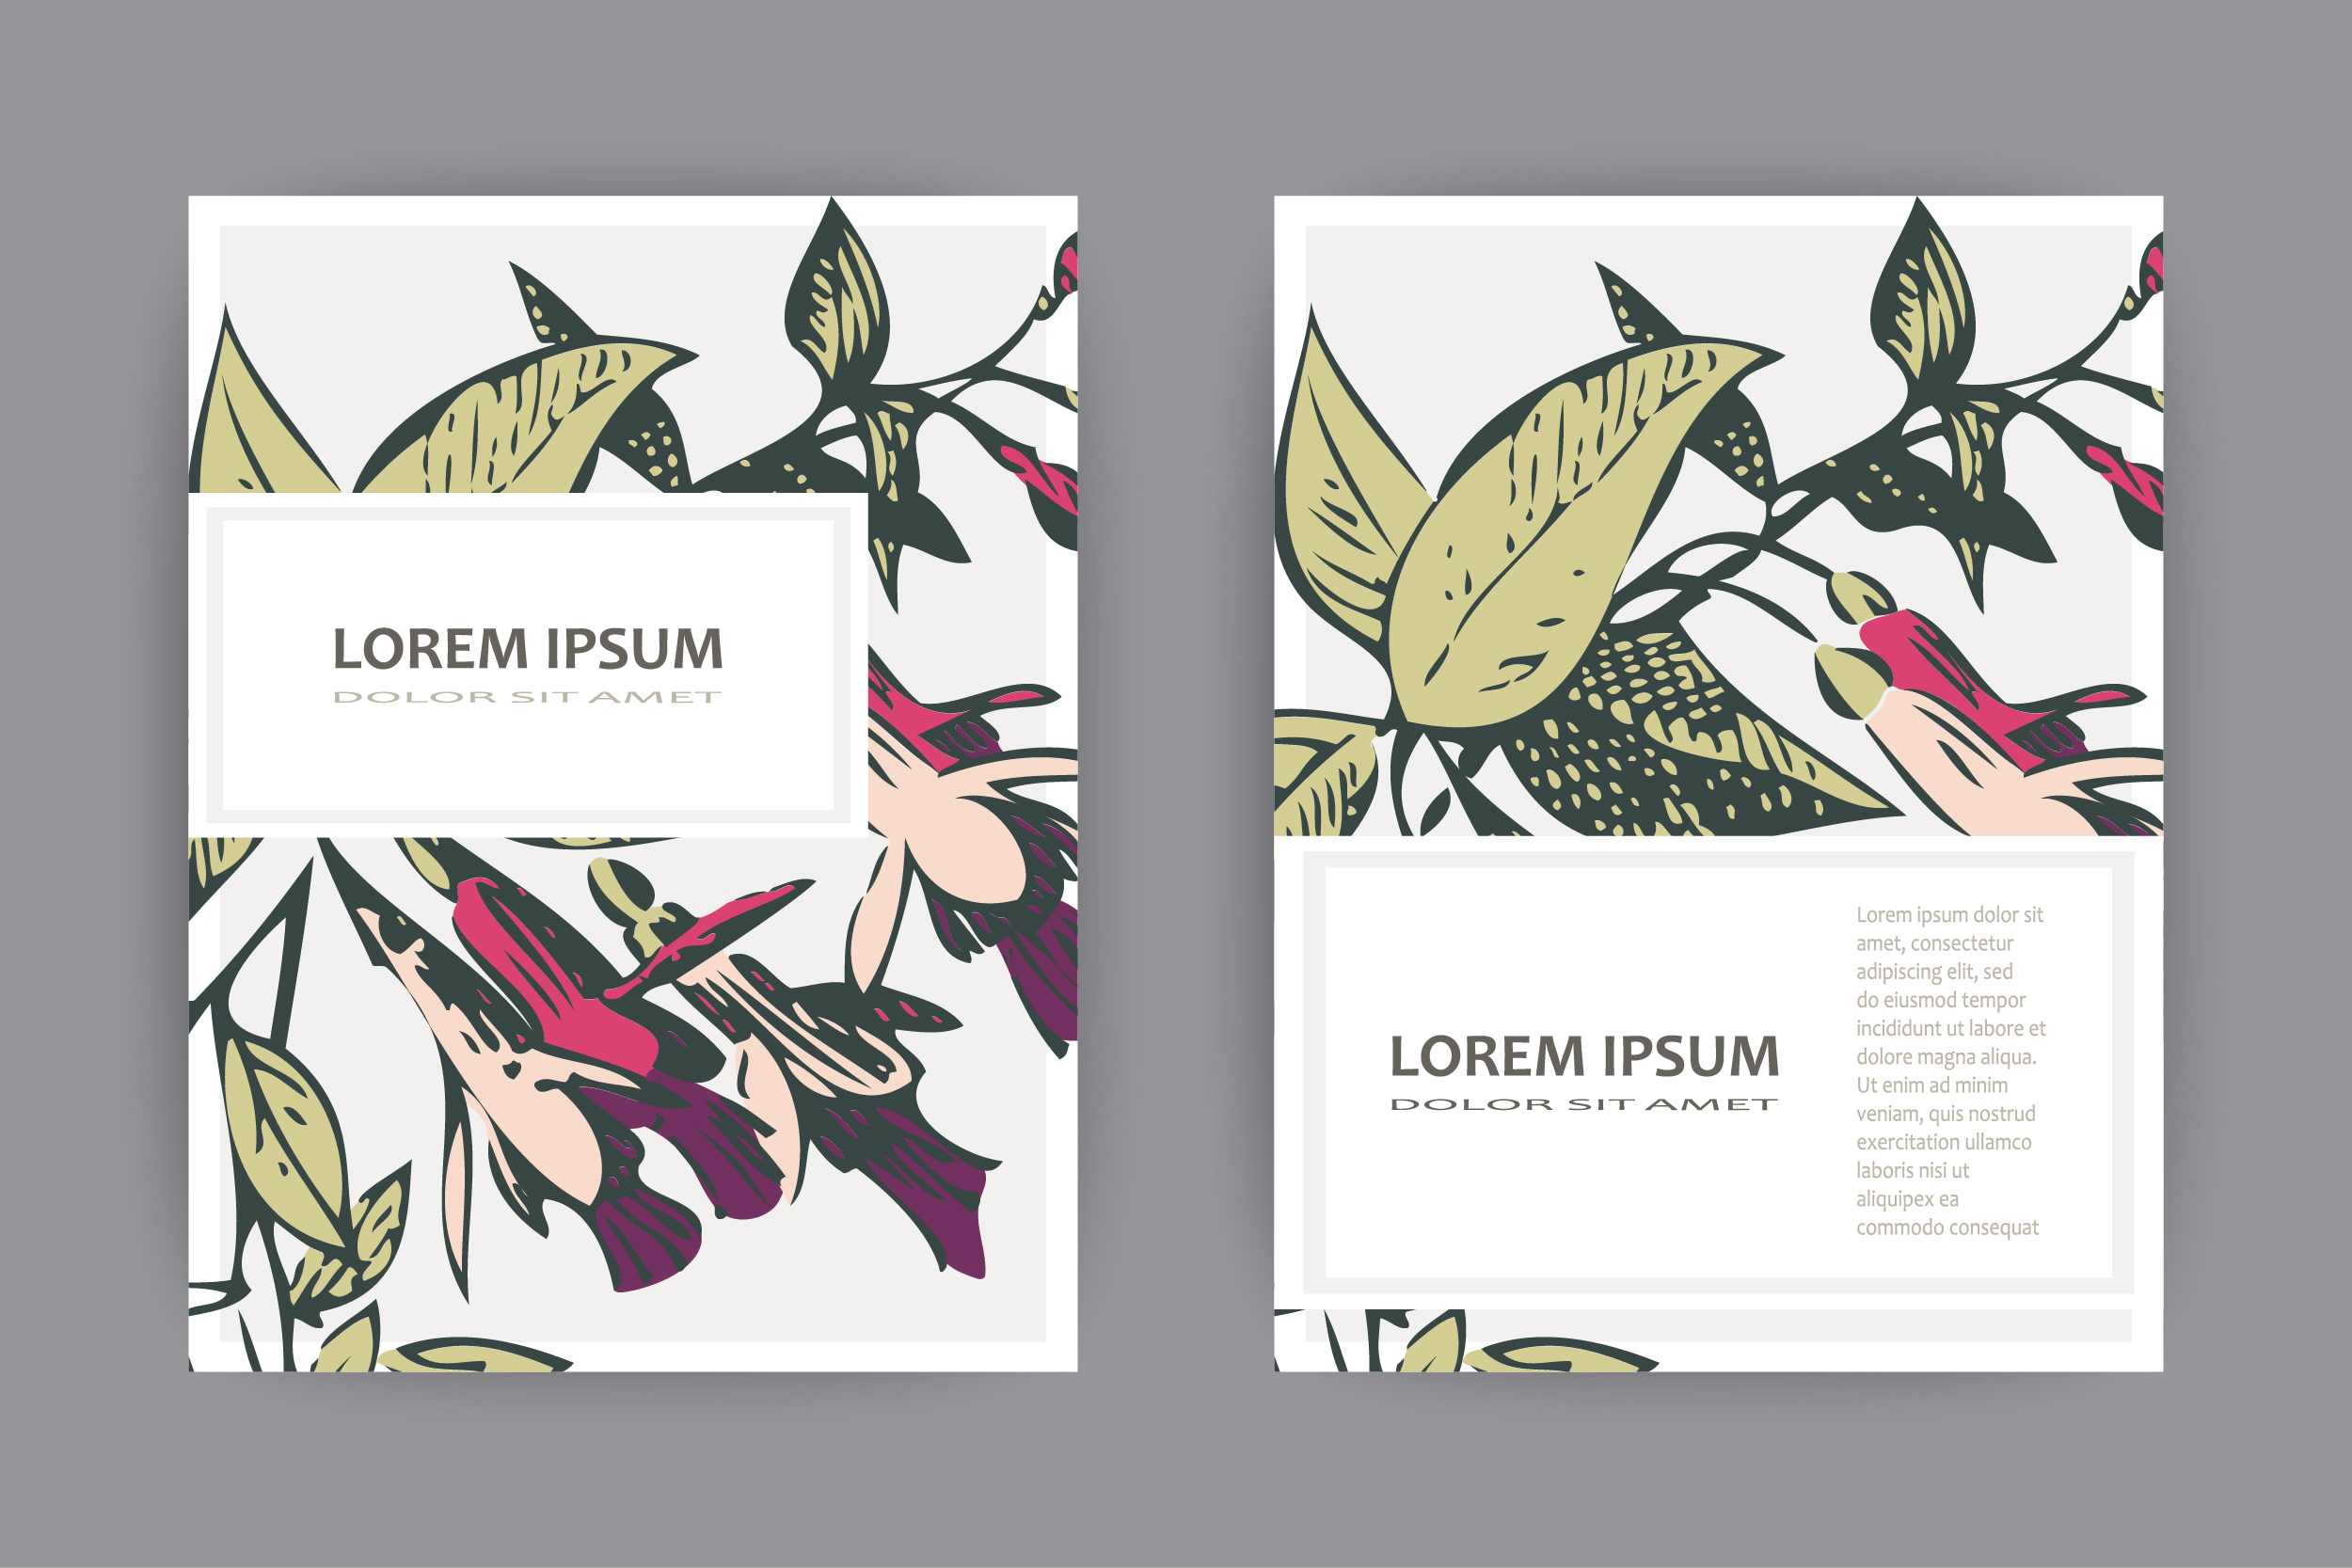 Fuchsia flower templates for card, invitation, wedding example image 1